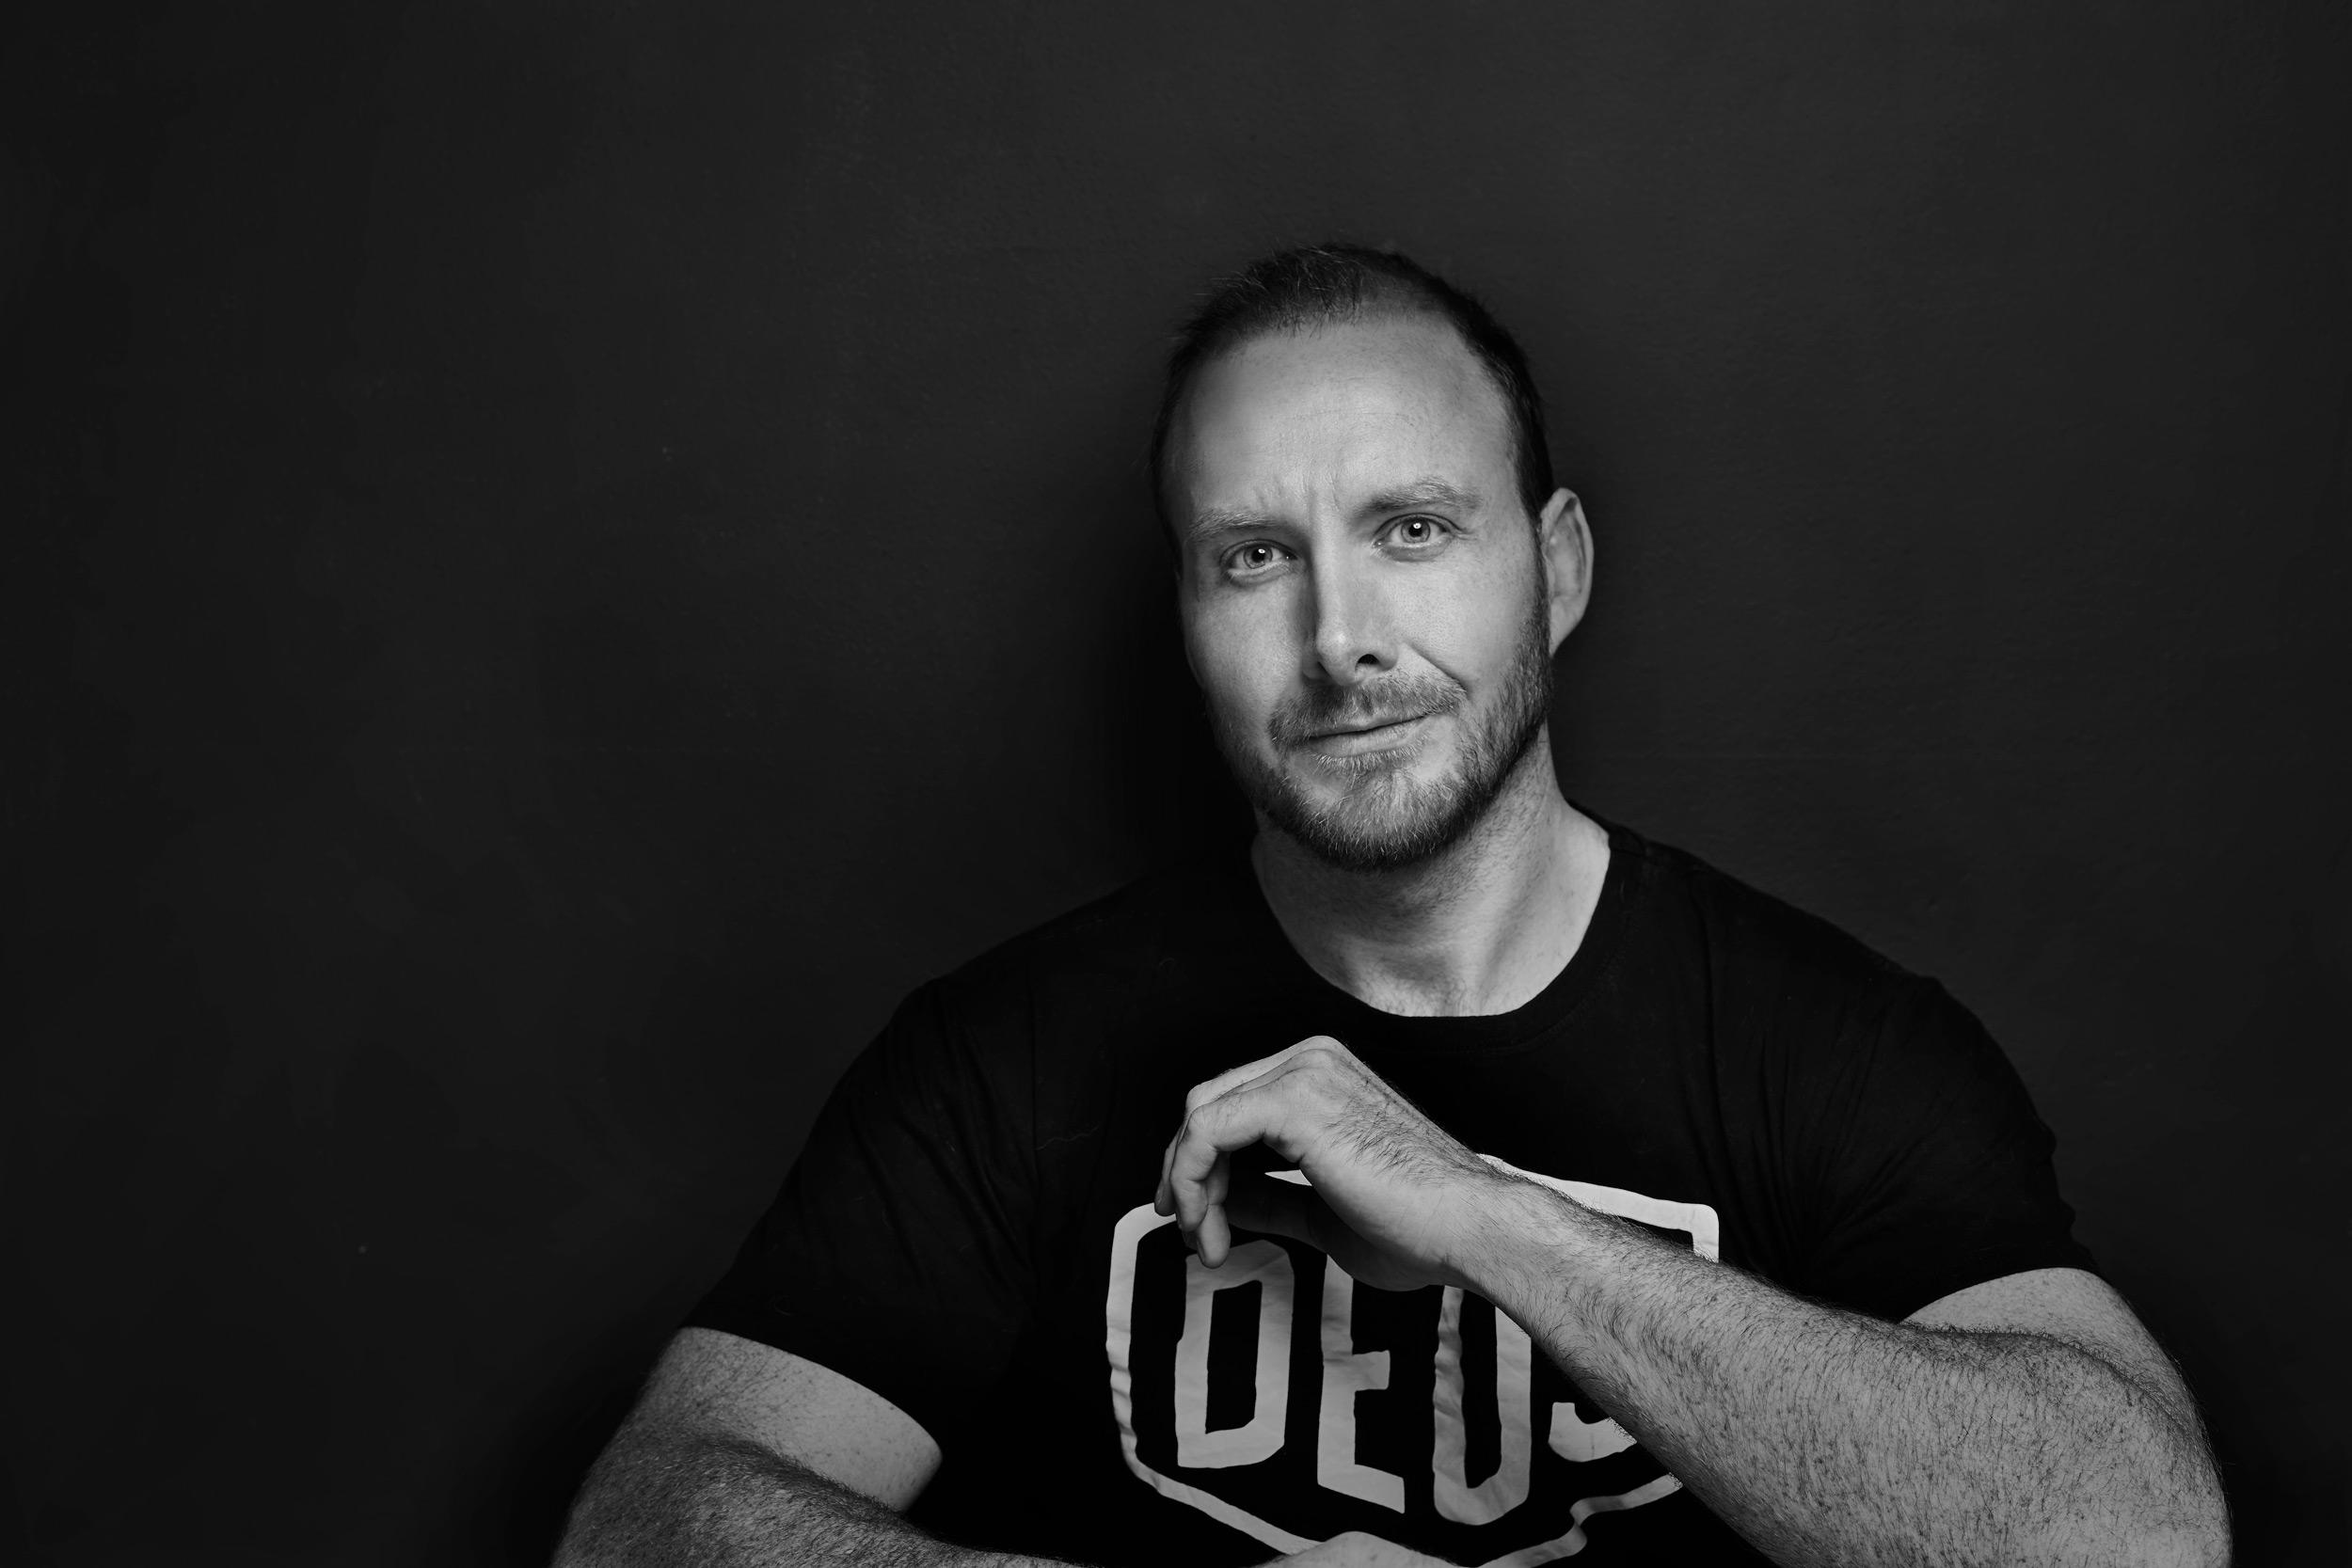 Seagram Pearce Automotive Advertising Photographer Profile